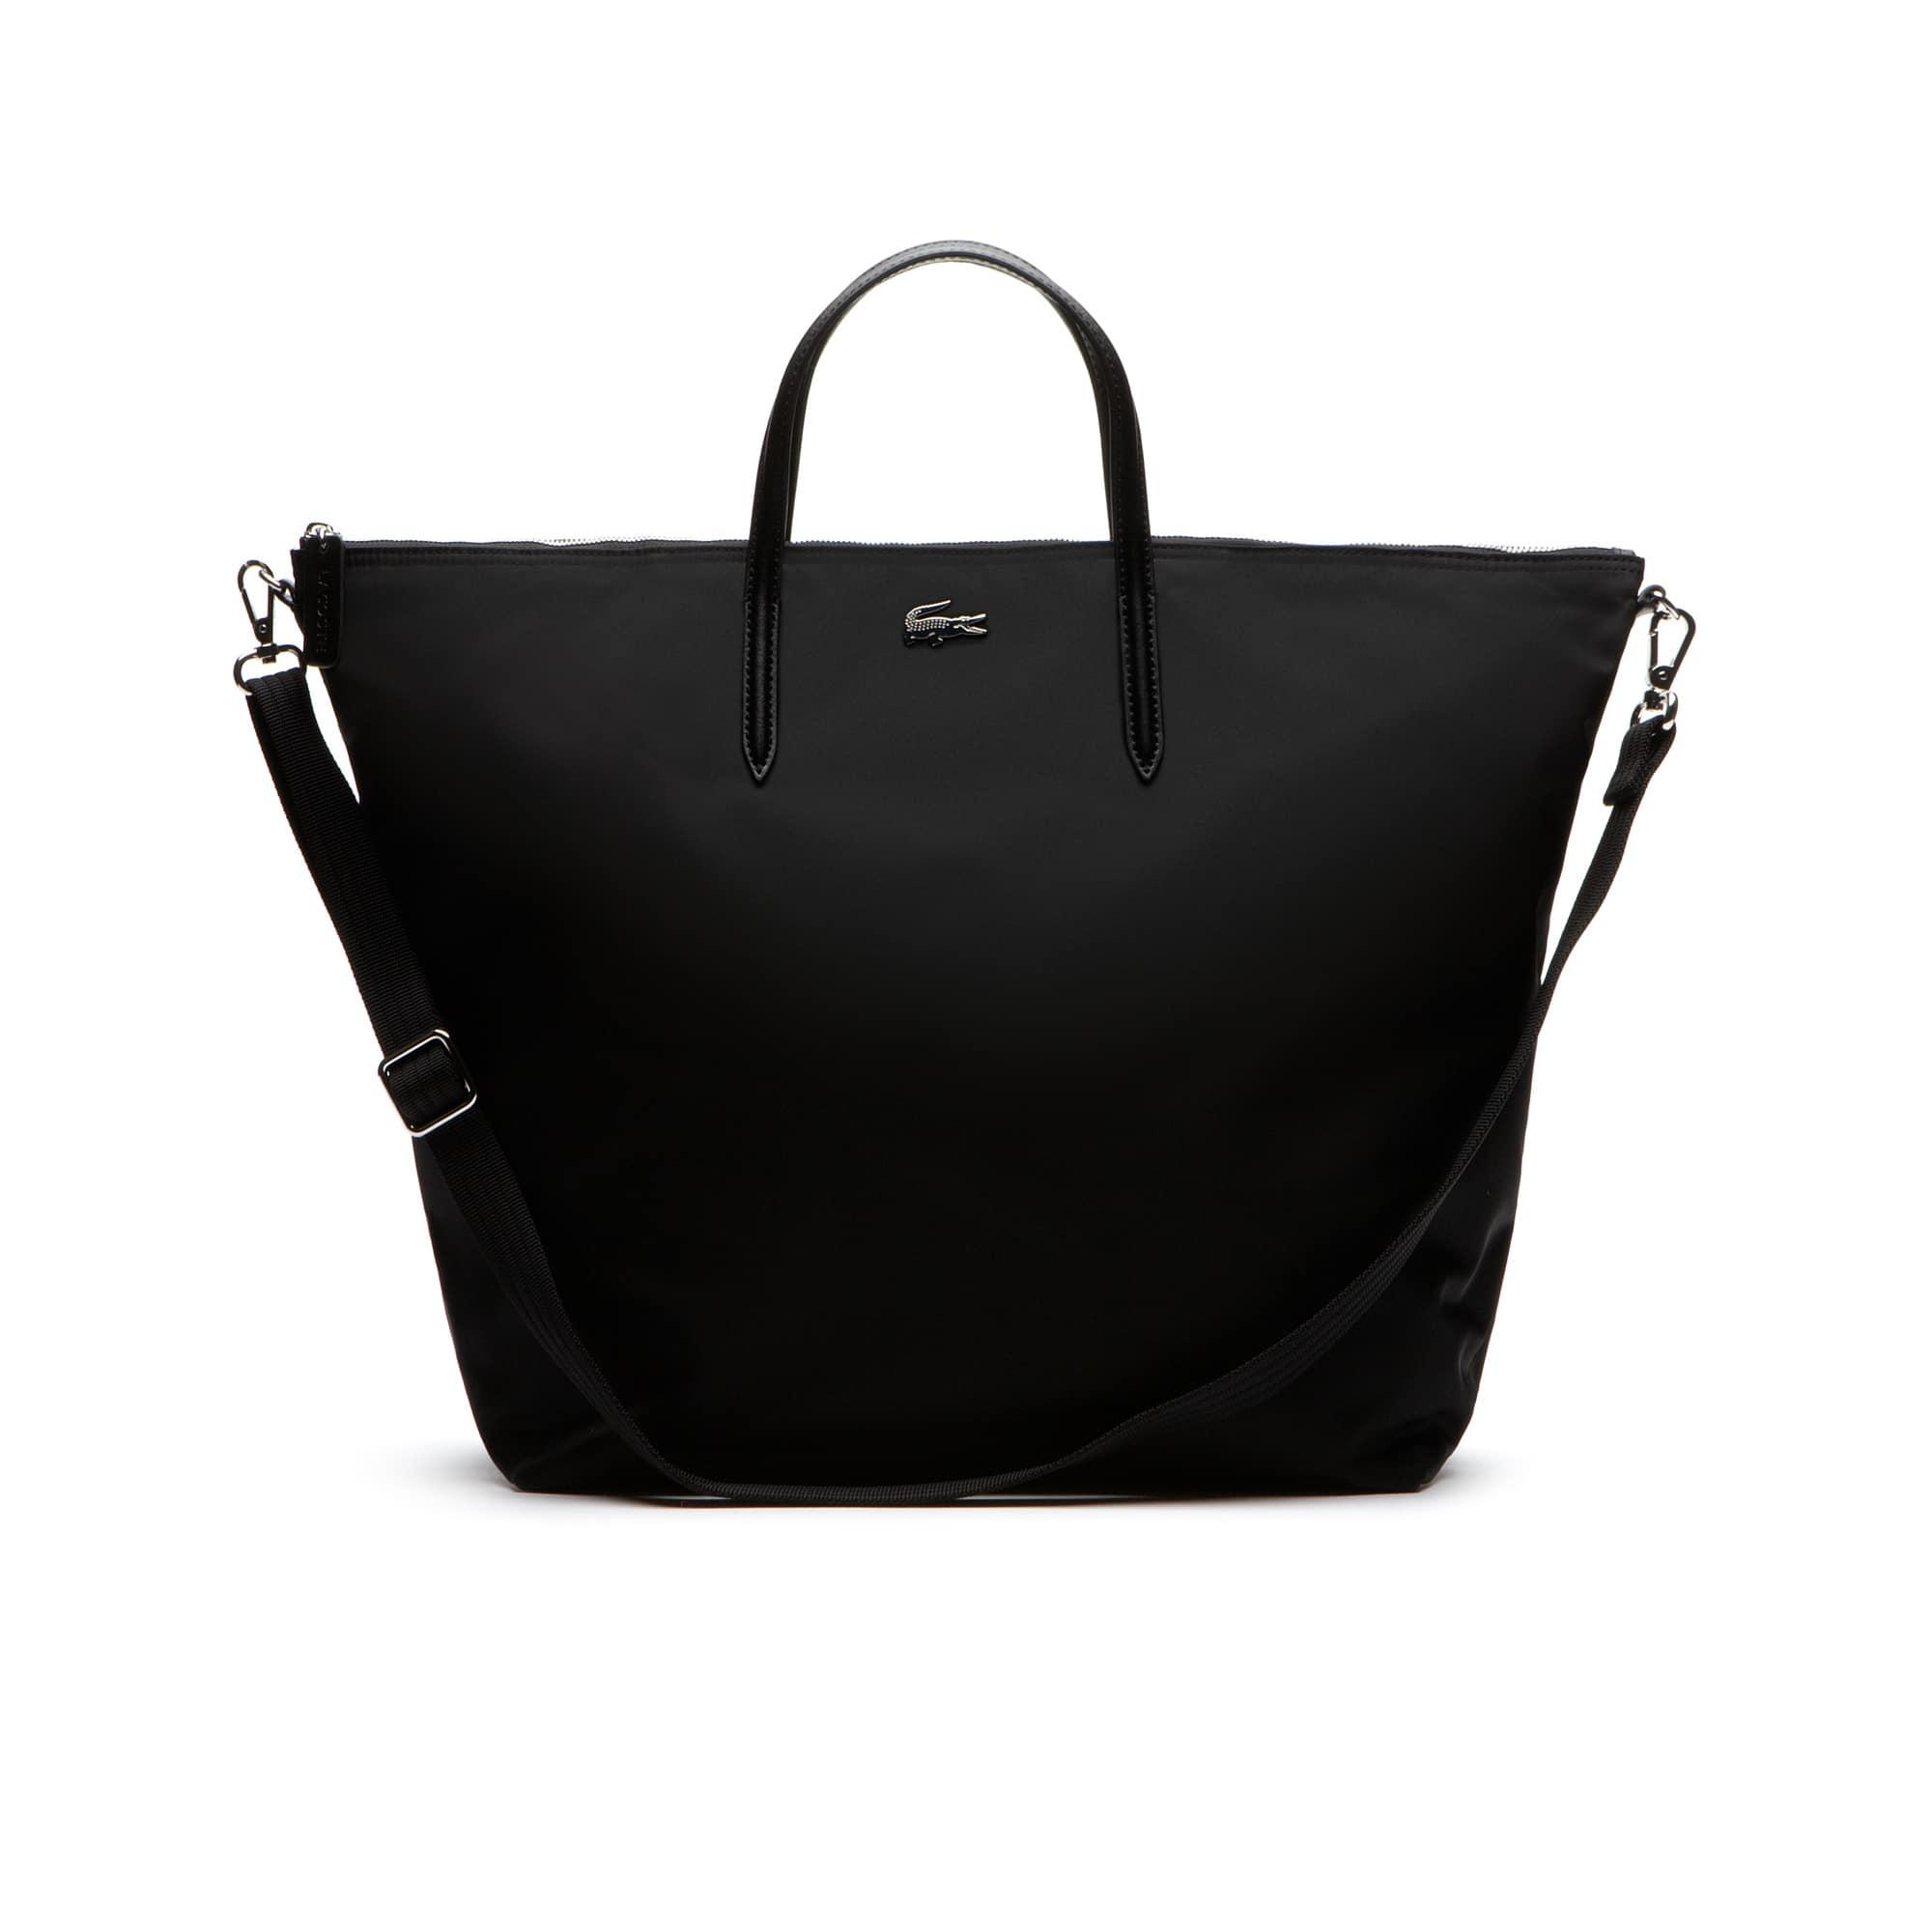 L.12.12 CONCEPT Nylon zippered travel tote bag